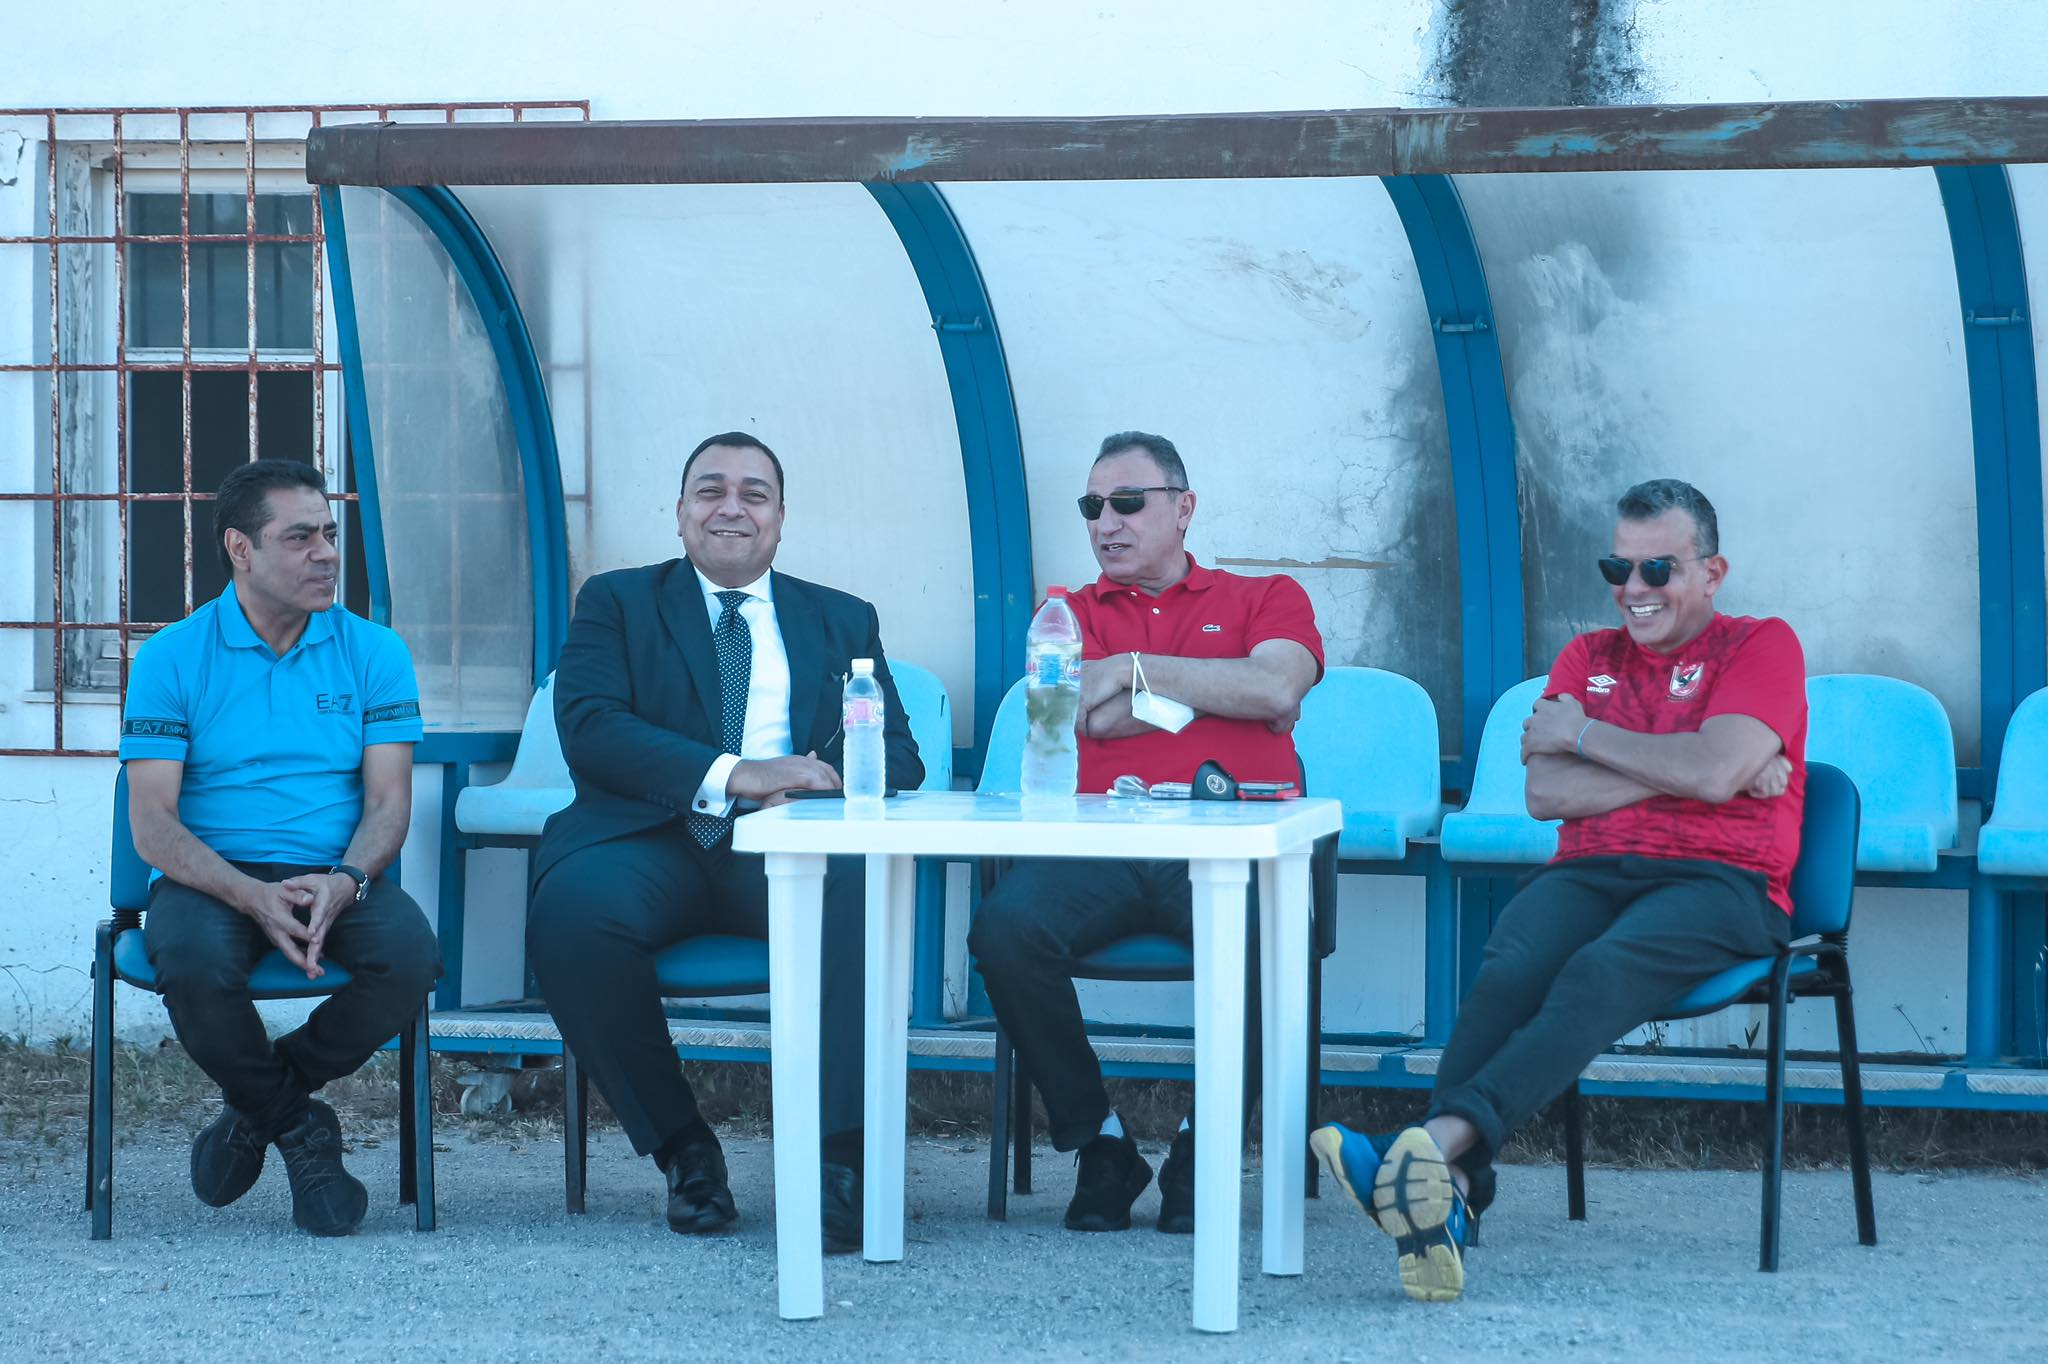 سفير مصر - تونس